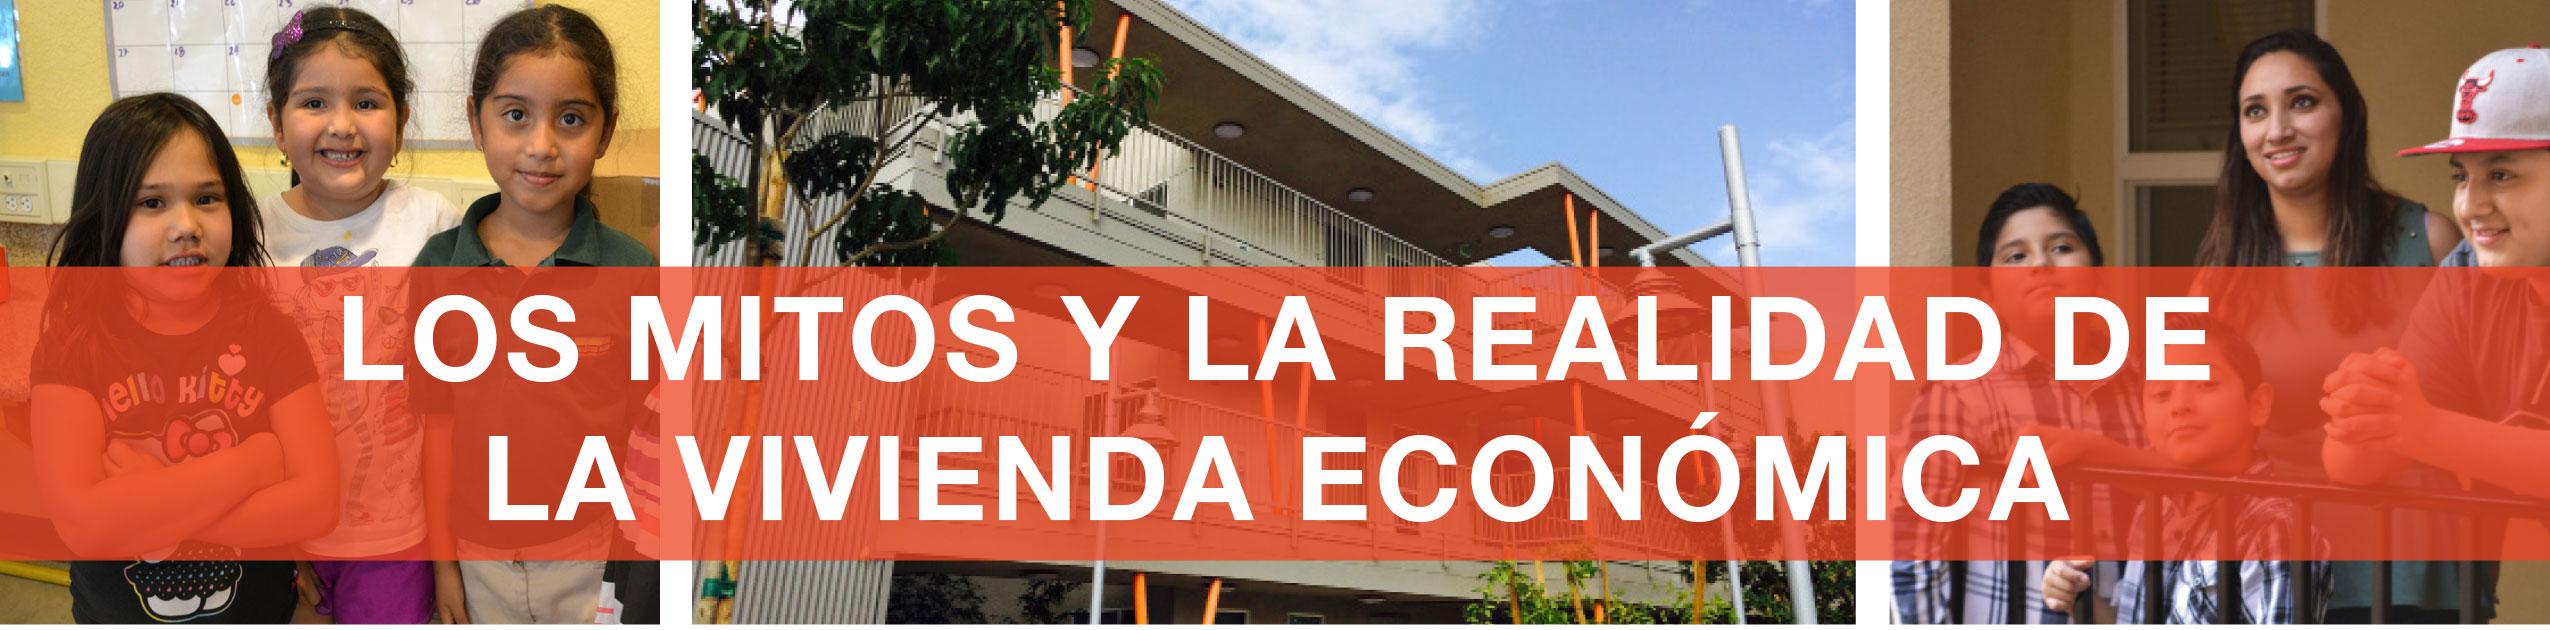 BANNER_2016_SPANISH-affordable-housing-myths-sheet.jpg